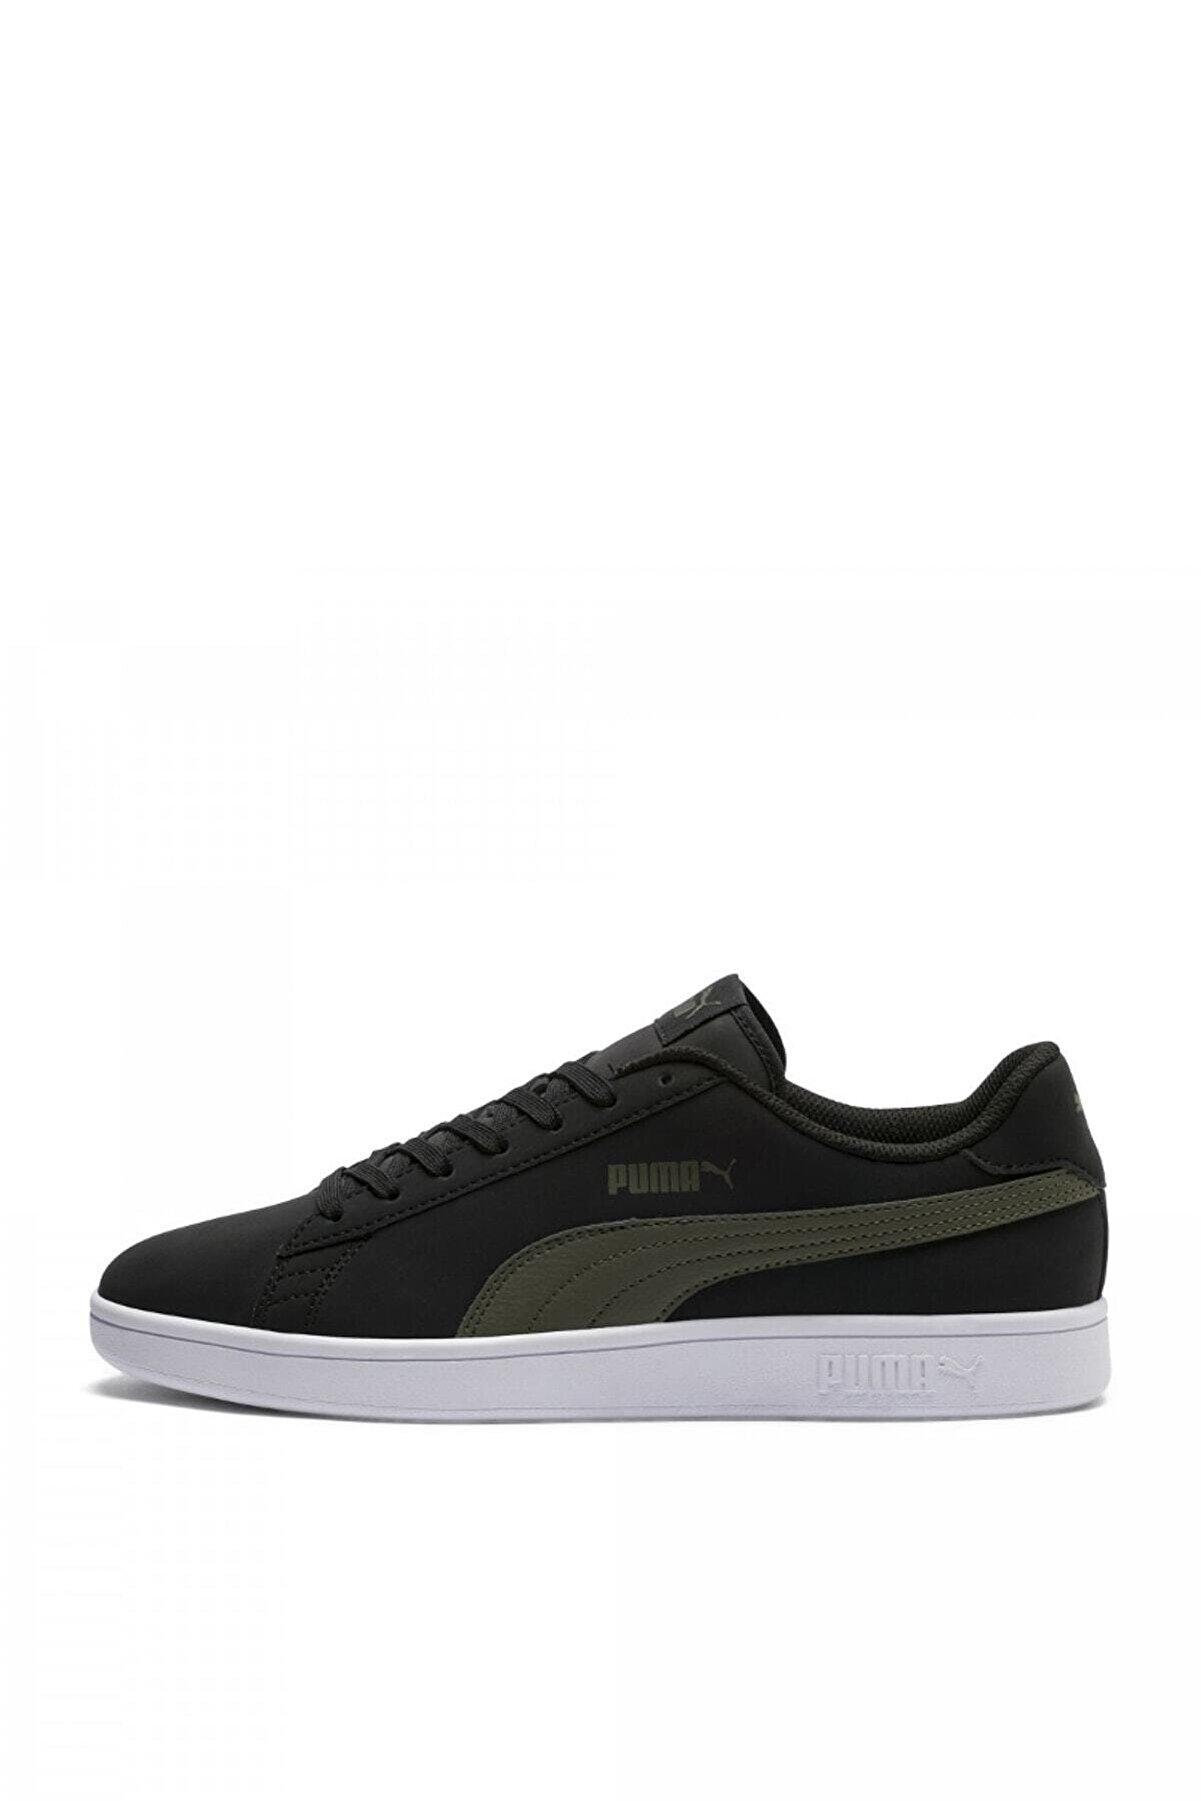 Puma Puma Smash V2 Buck Siyah Haki Beyaz Erkek Sneaker Ayakkabı 100352142